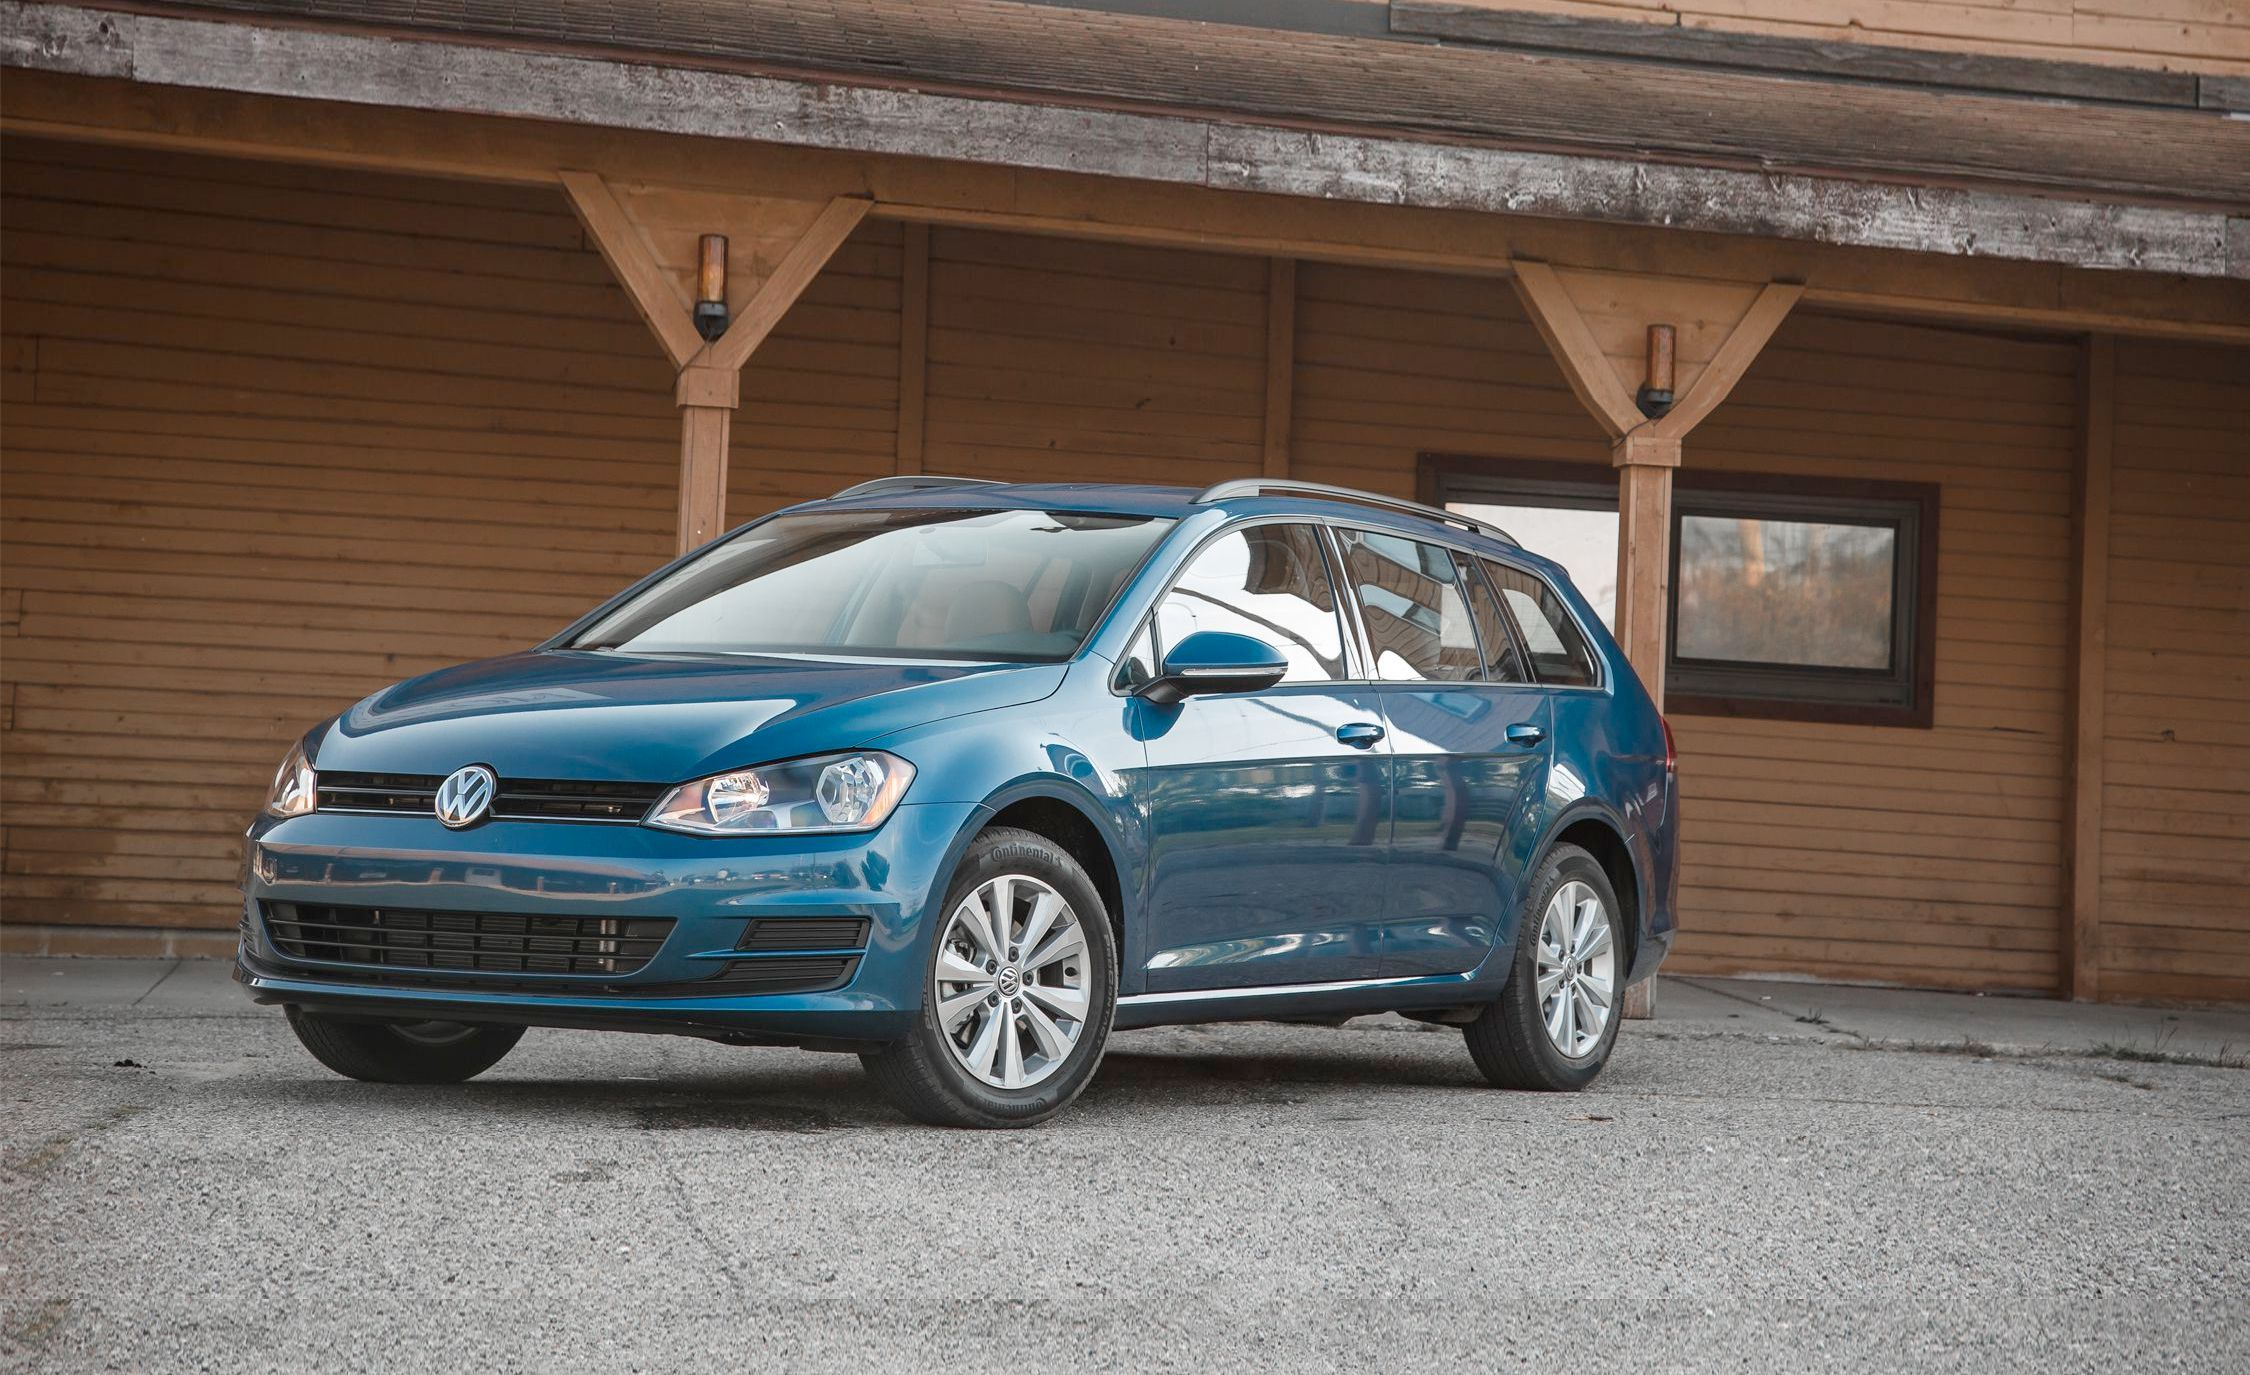 2017 Volkswagen Golf Sportwagen 4motion Instrumented Test 8211 Review Car And Driver